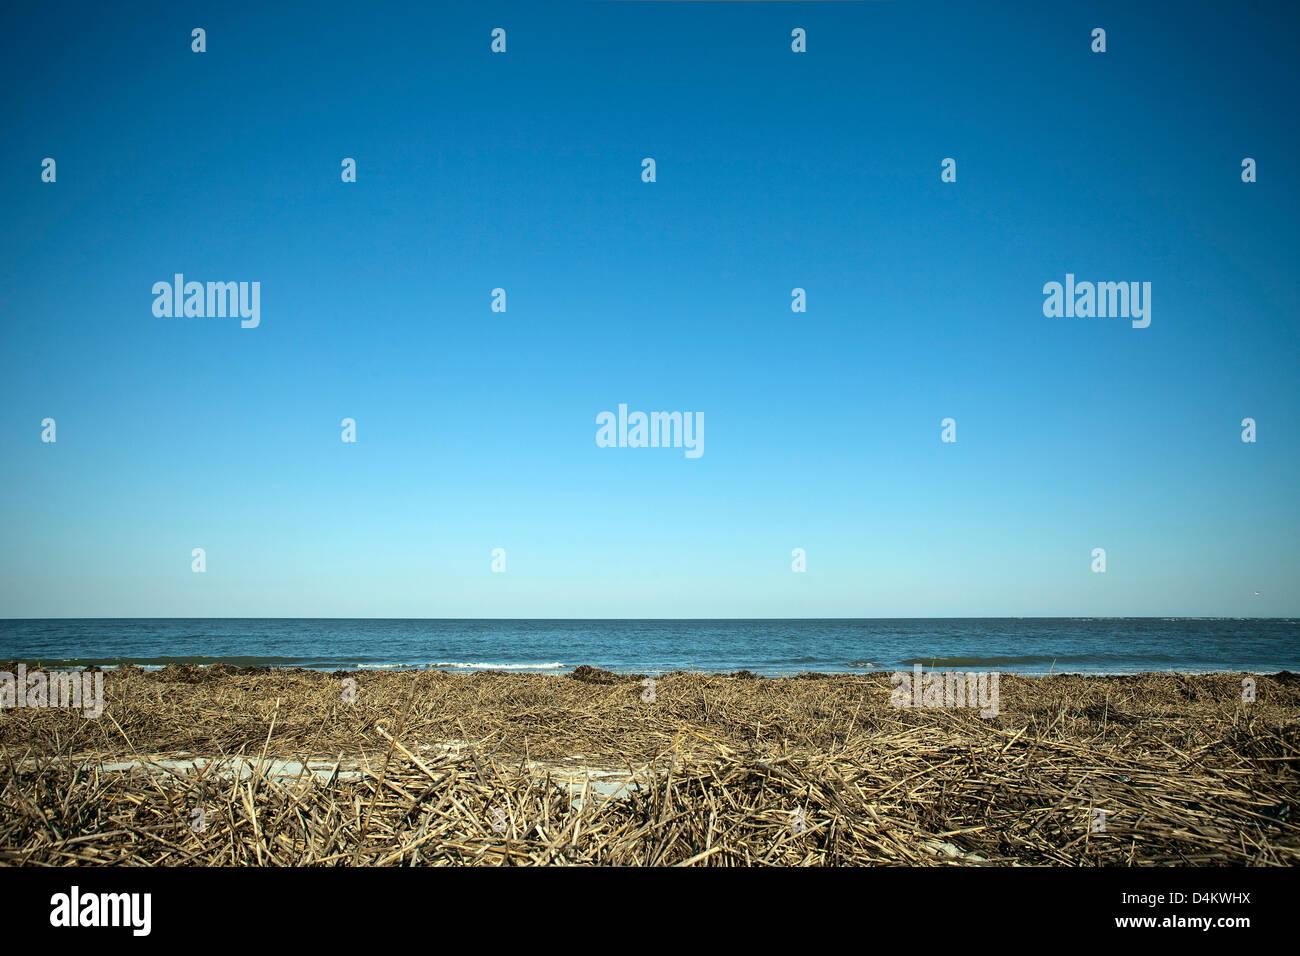 Trockenrasen und Strand Stockbild